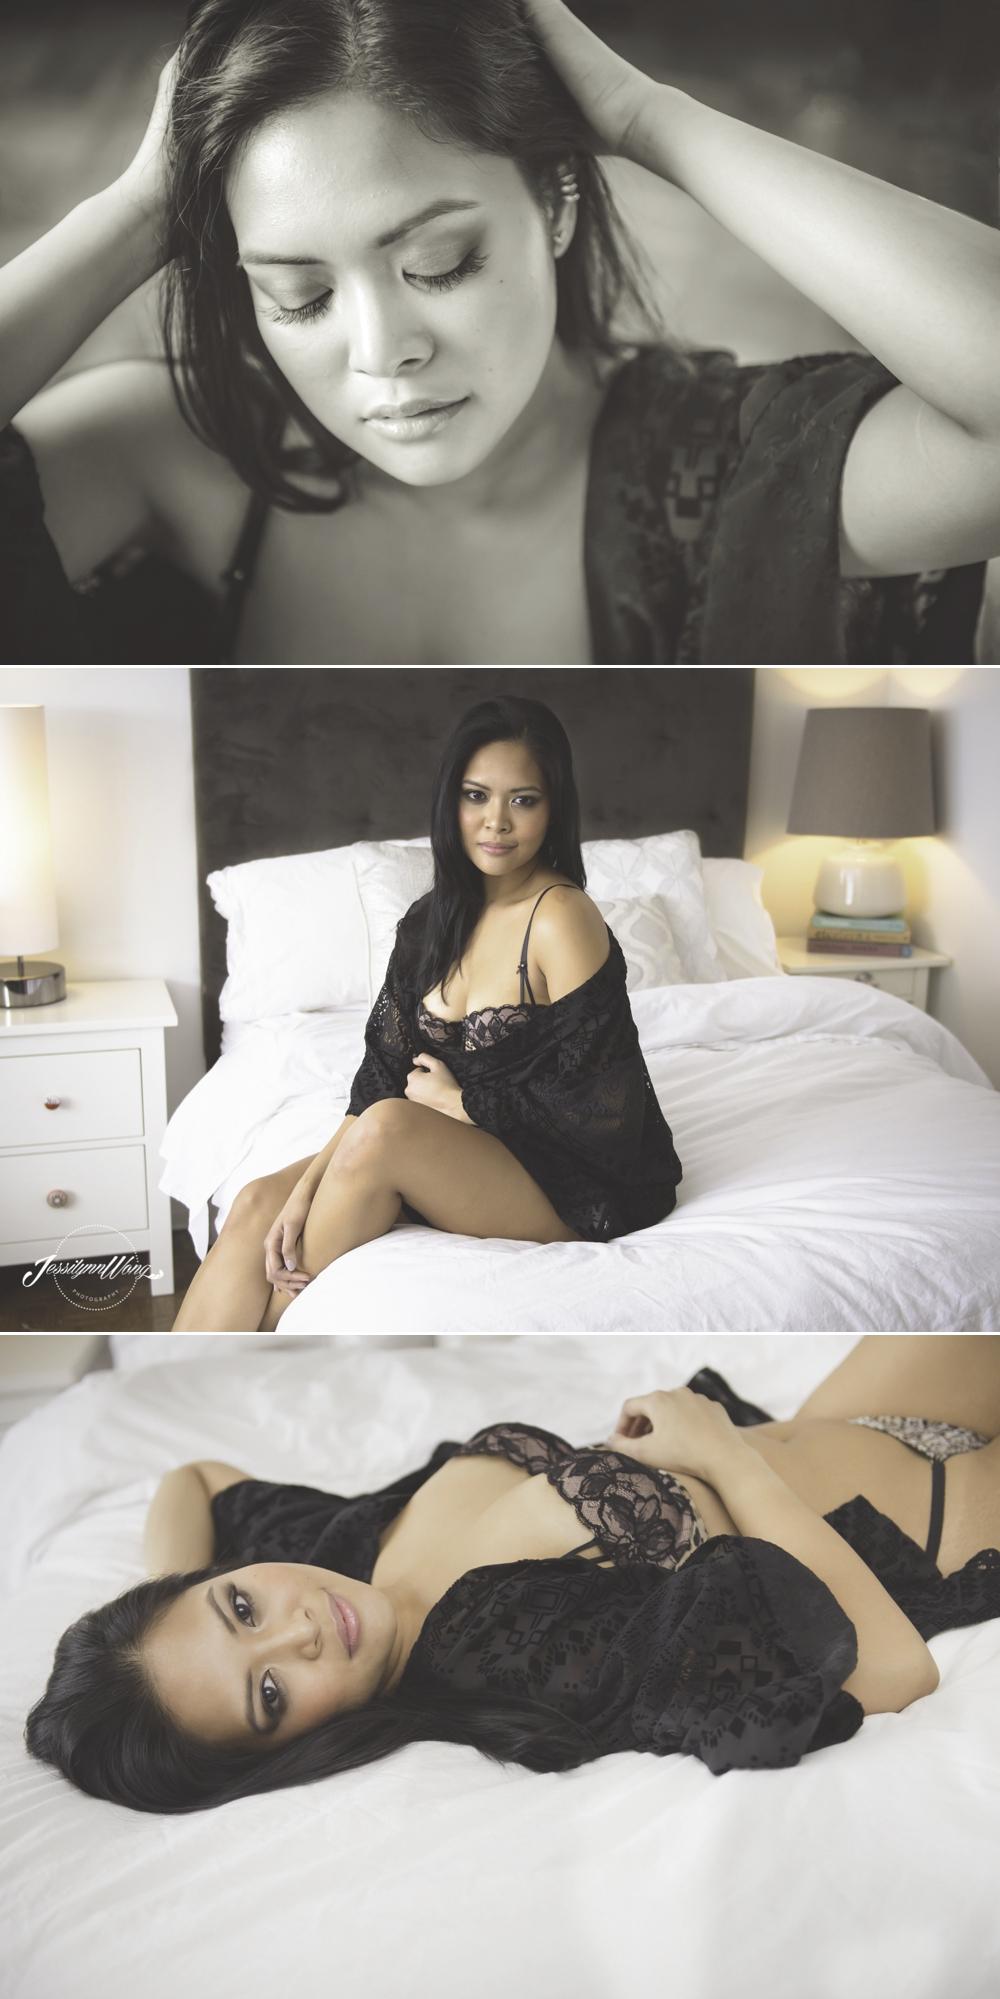 Jessilynn+Wong+Photography+-+Toronto+Boudoir+Photography+Shiela (1).jpg